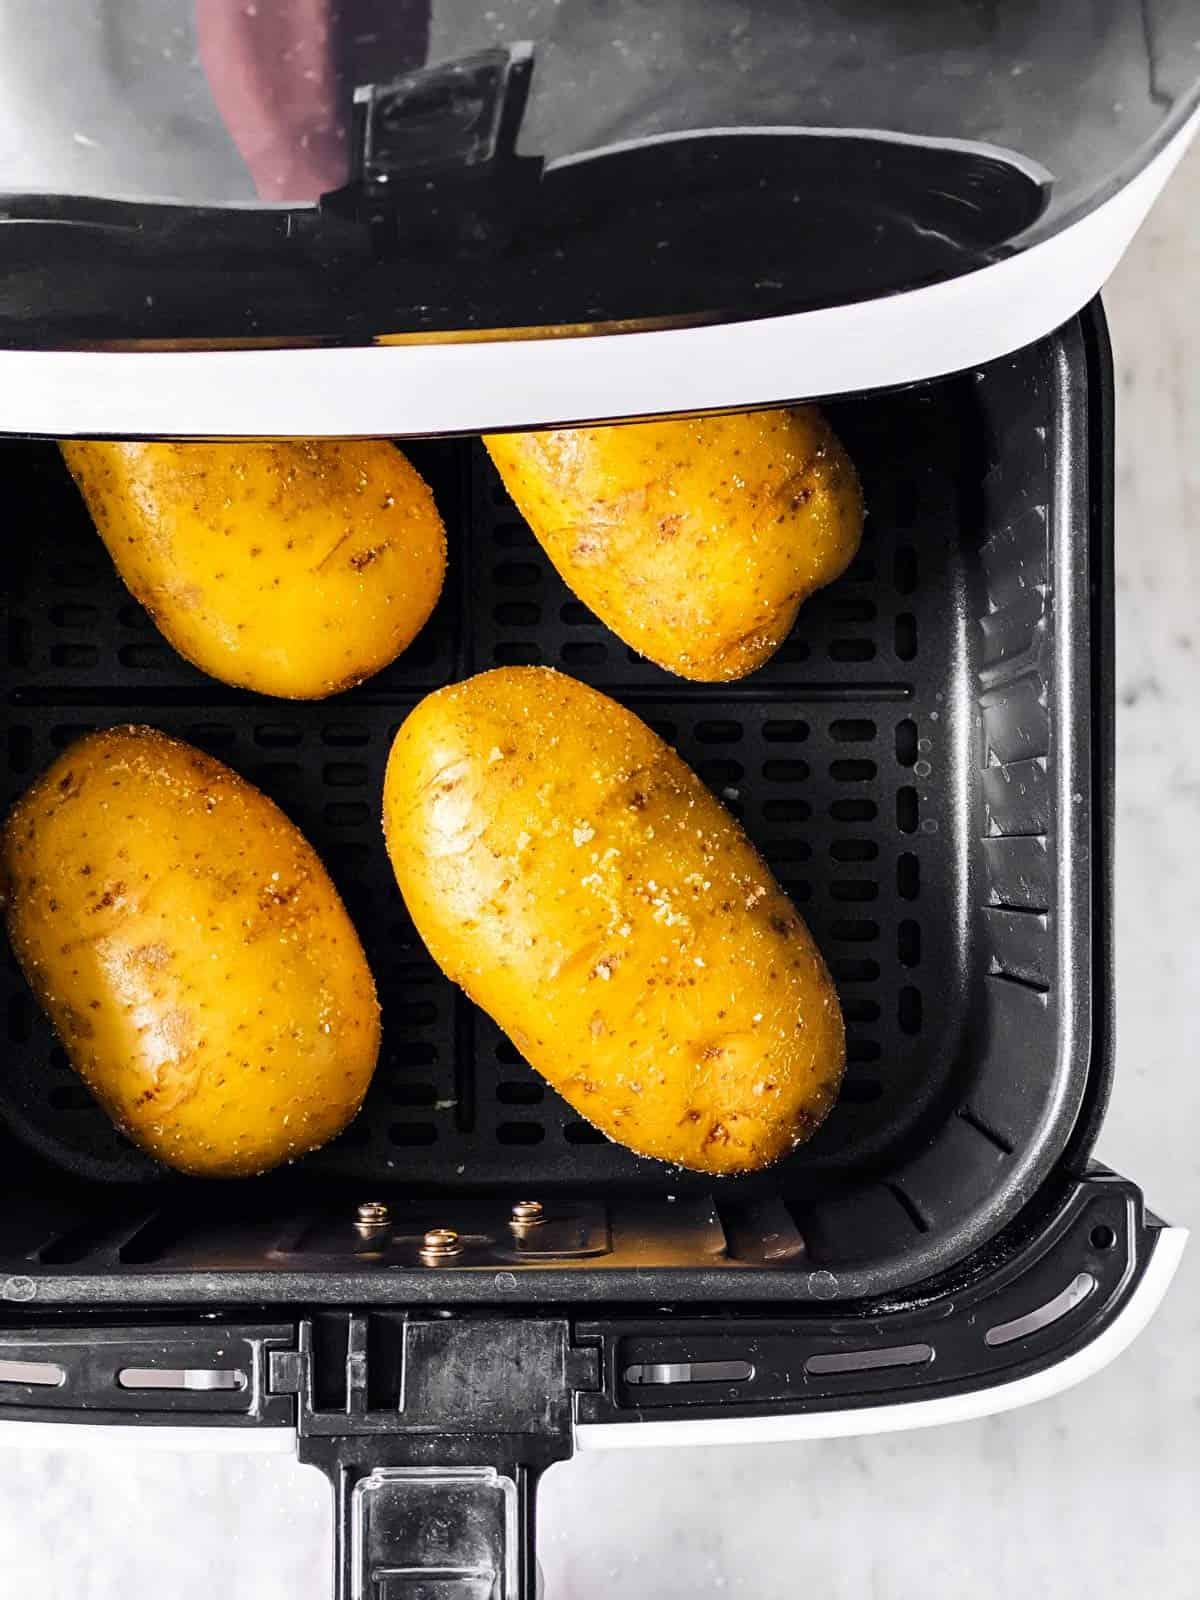 raw russet potatoes in air fryer basket